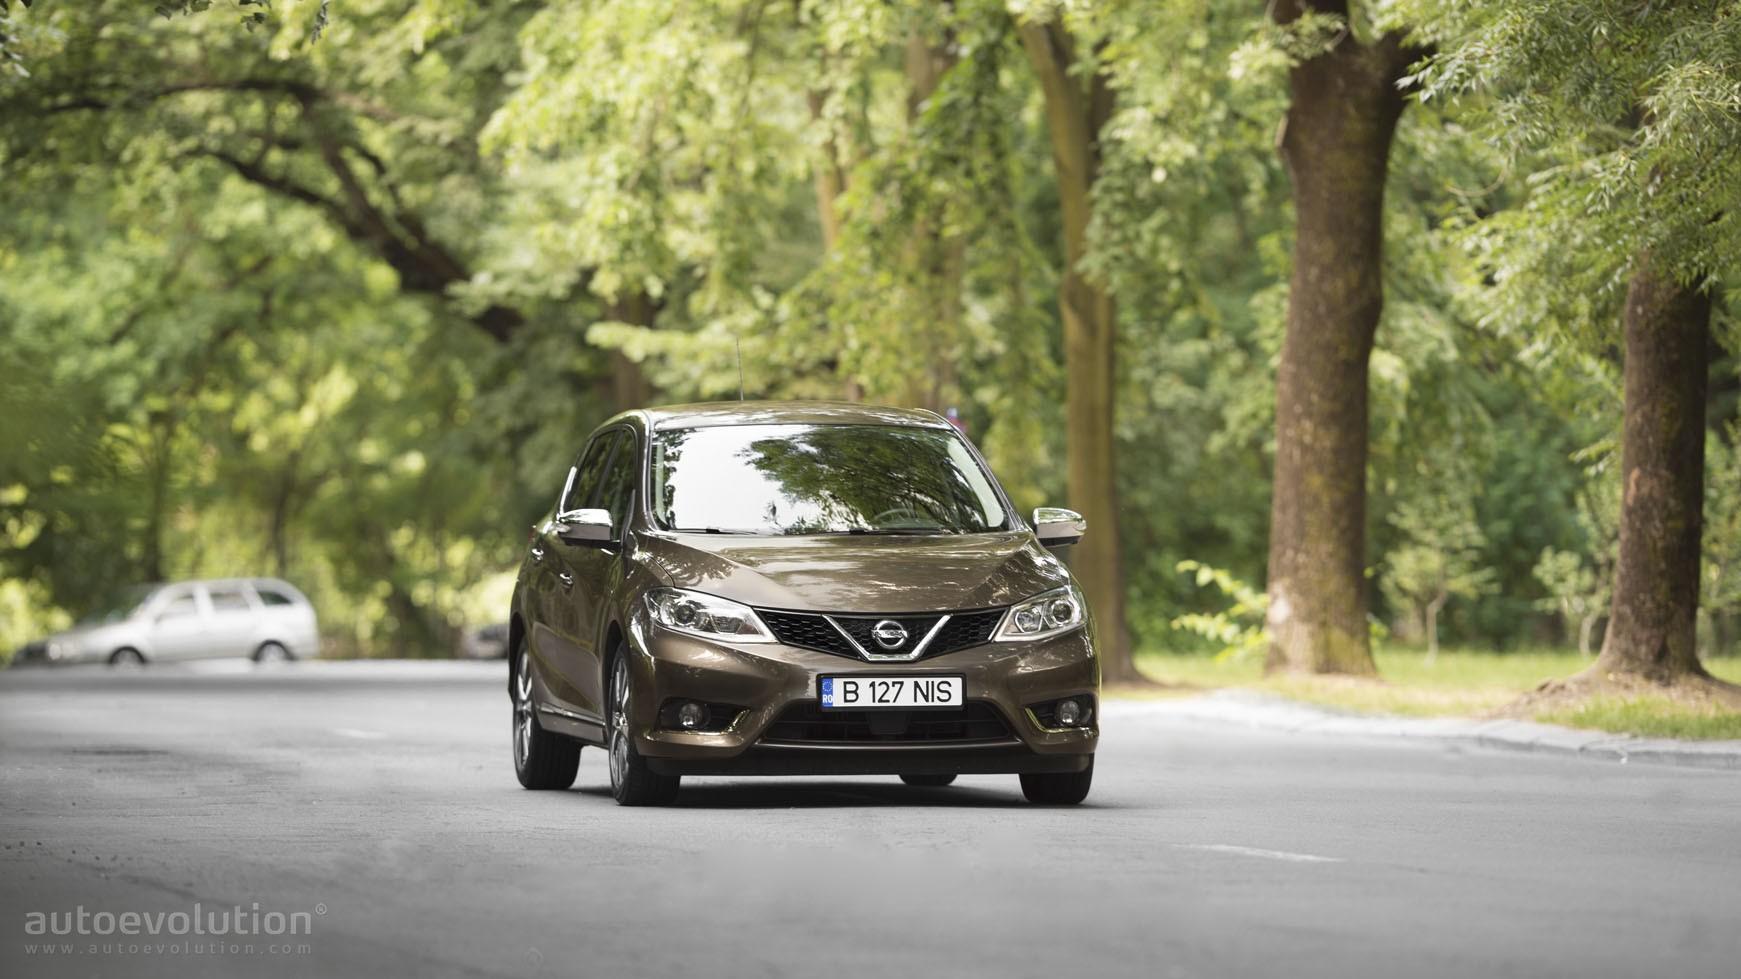 2015 Nissan Pulsar Review - autoevolution